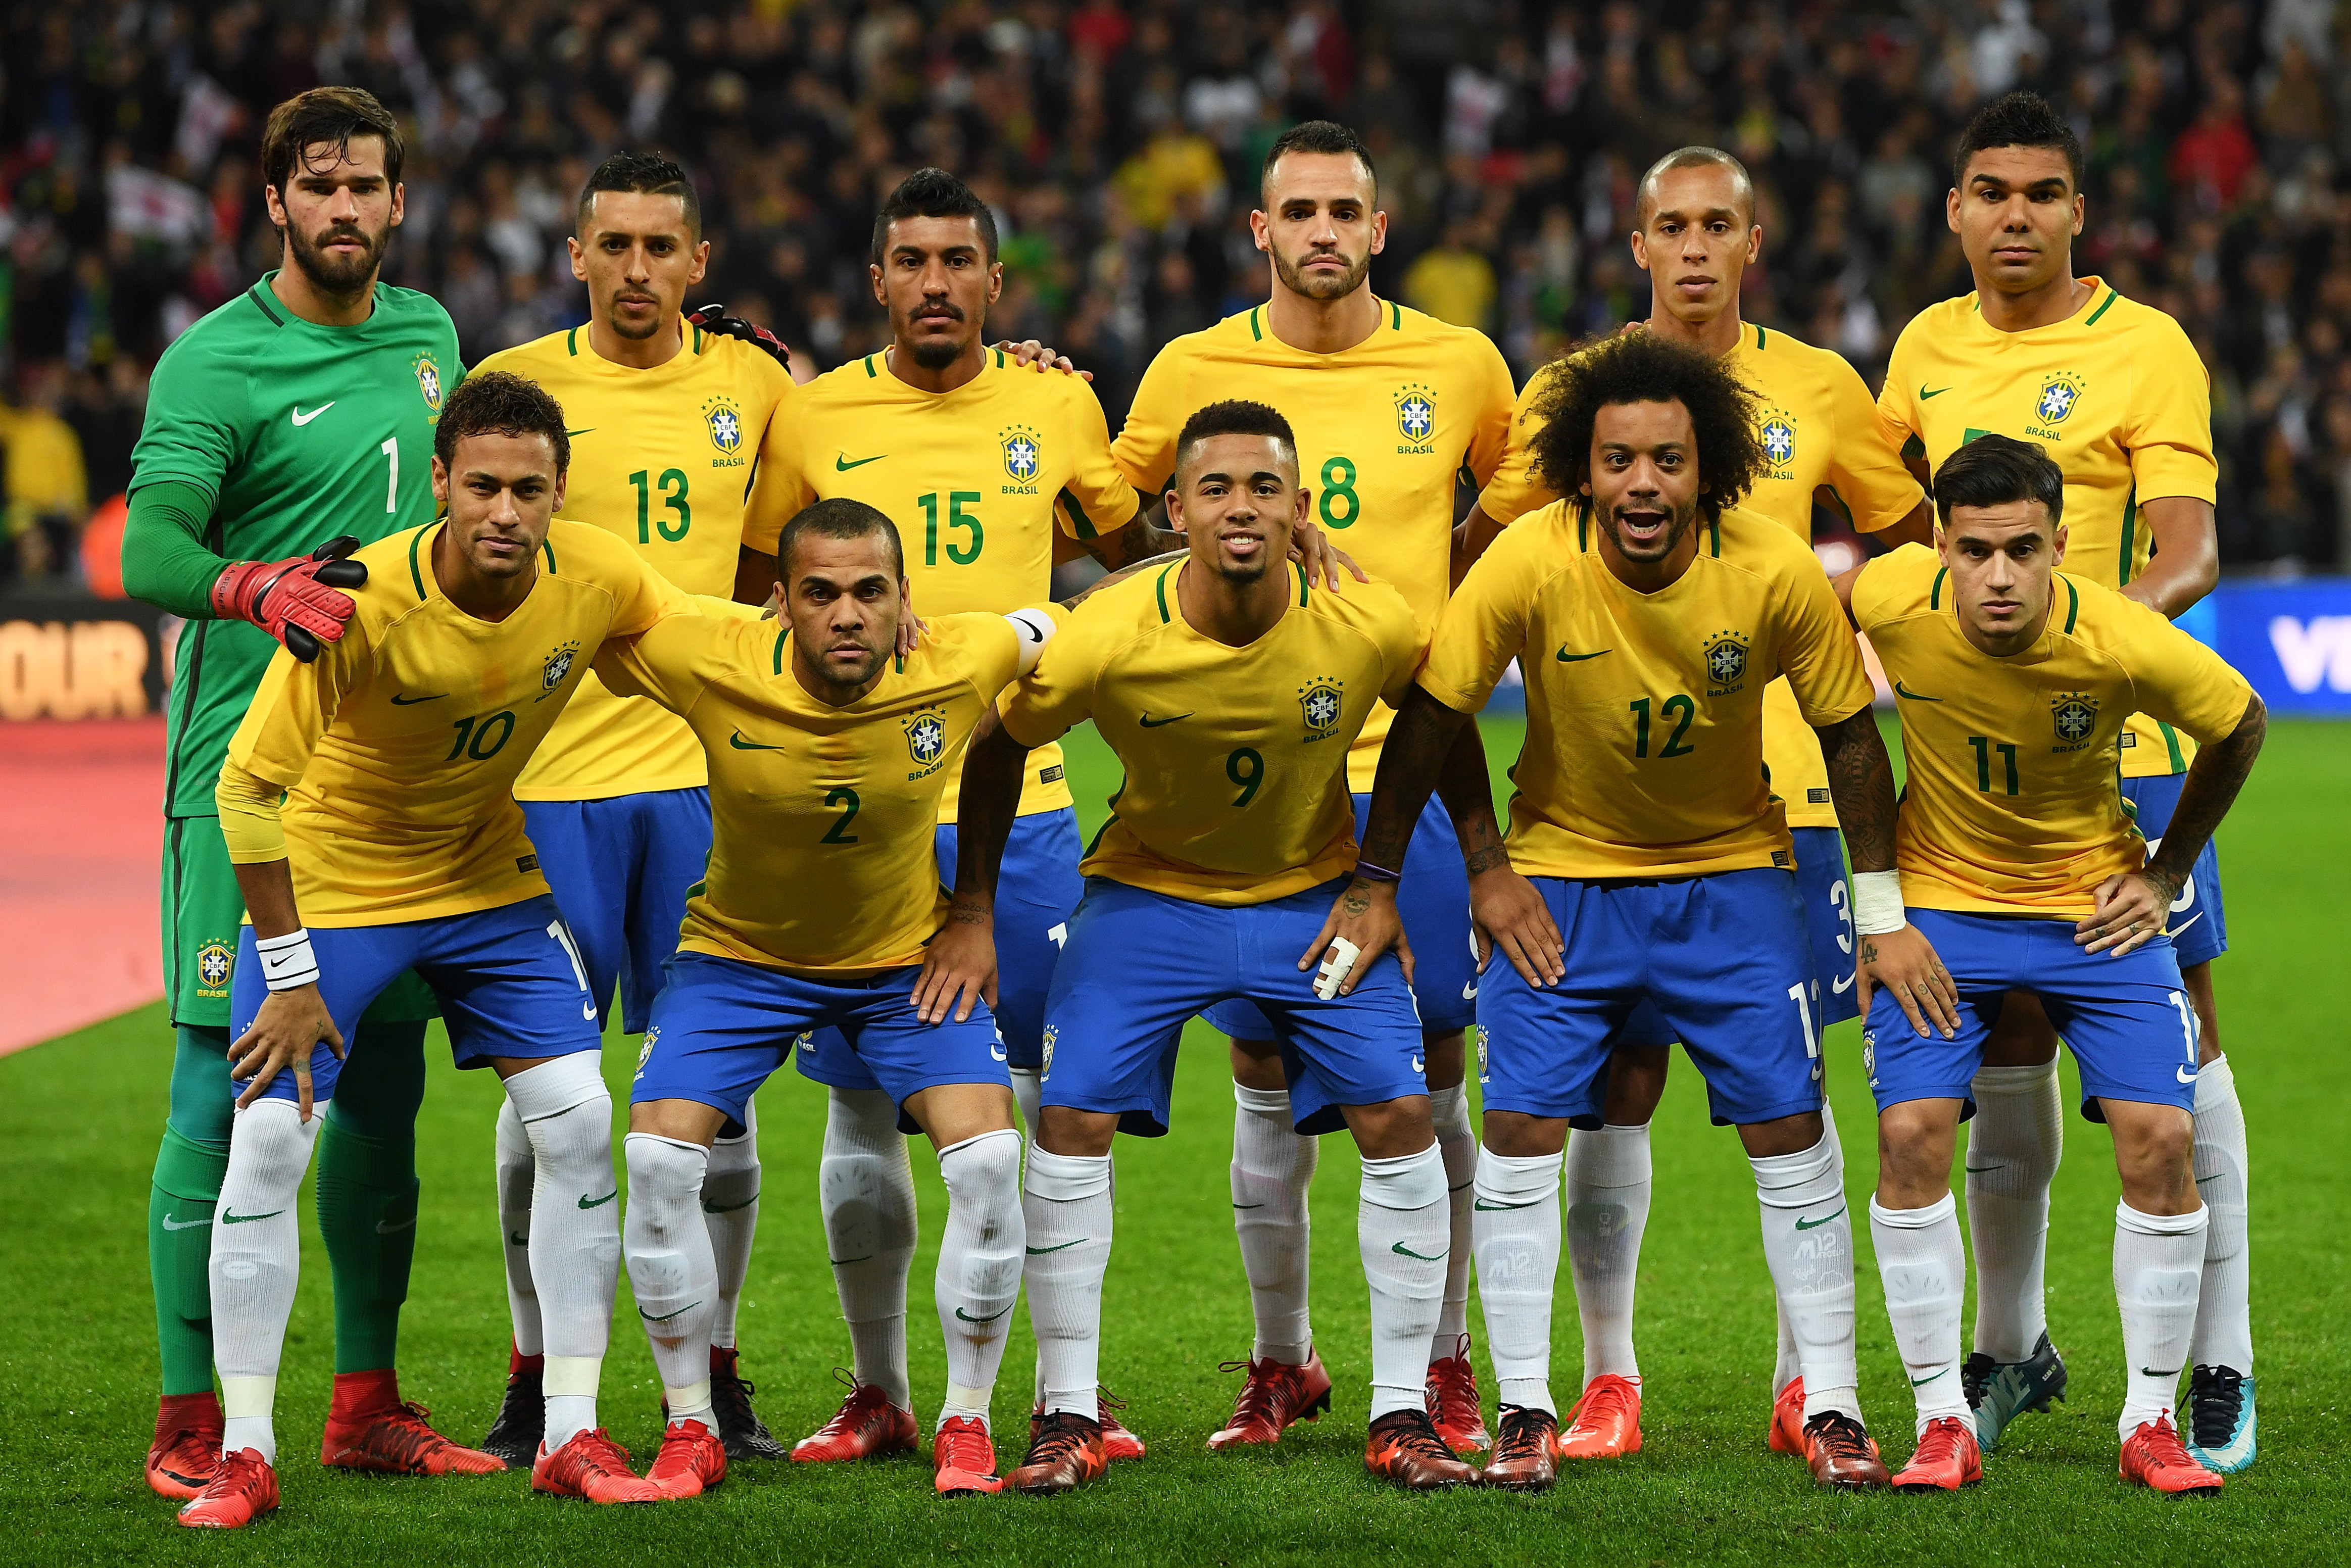 brasilien wm kader 2002